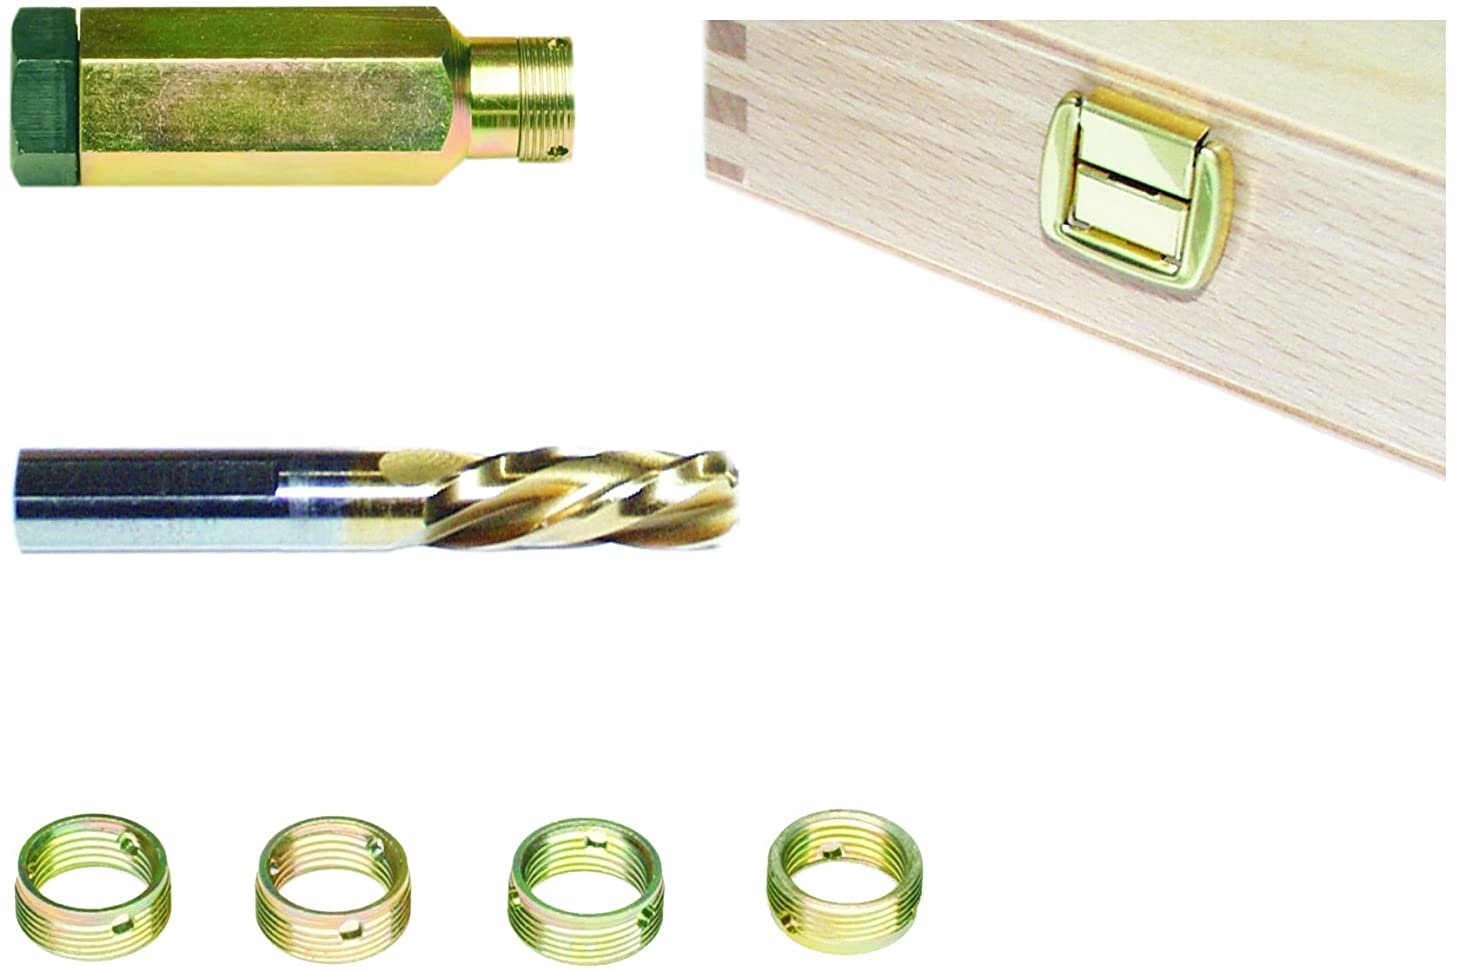 Mueller-Kueps 505 218 Oxygen Sensor Repair Kit